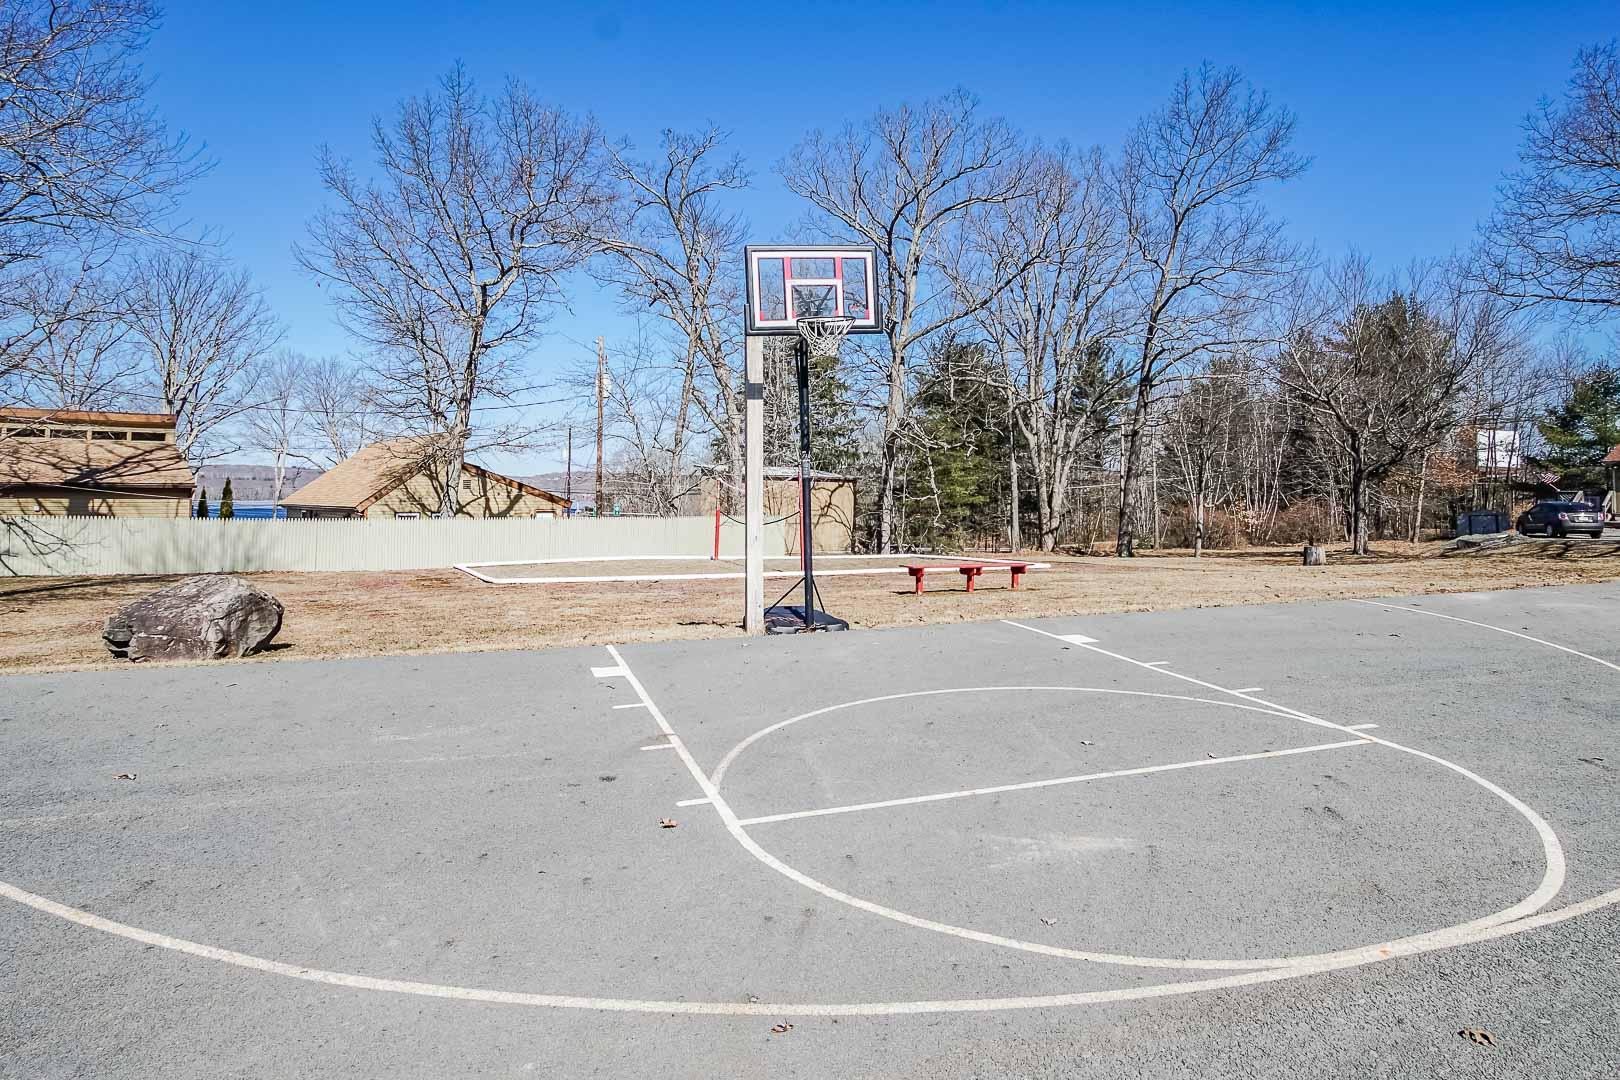 A spacious basketball court at VRI's Tanglwood Resort in Pennsylvania.